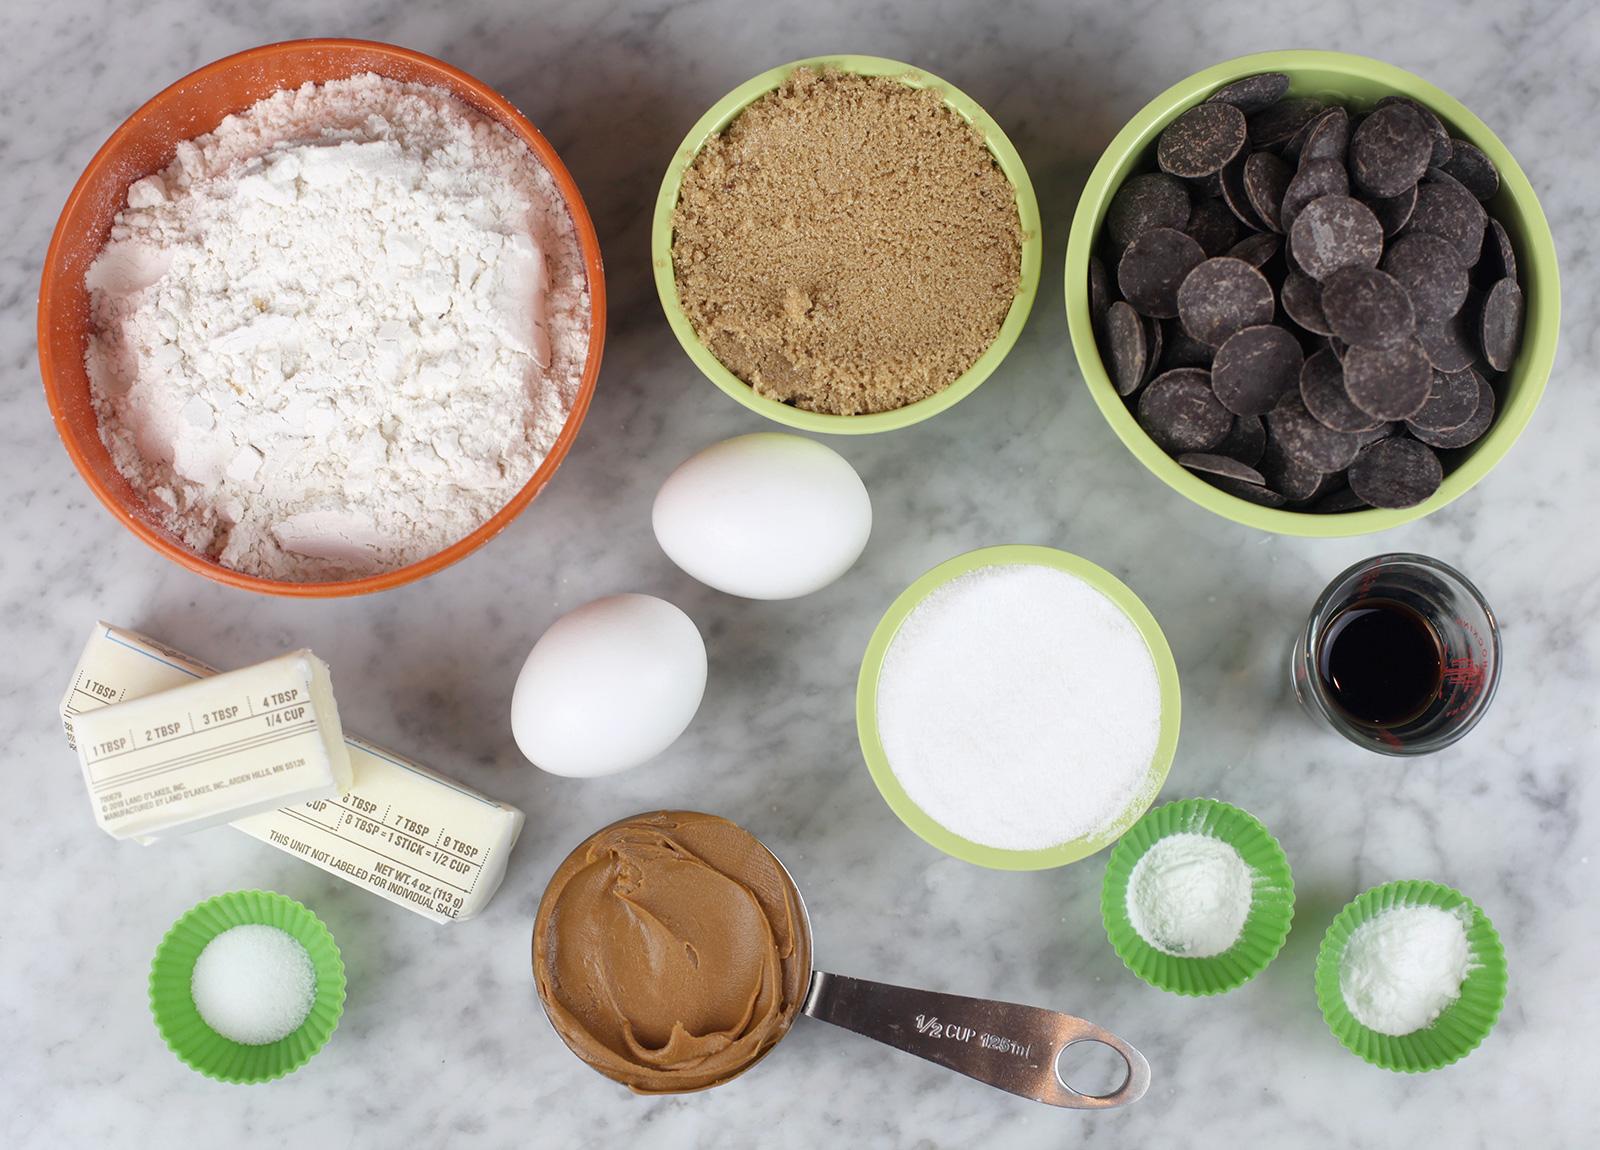 Biscoff Chocolate Chip Cookie Ingredients